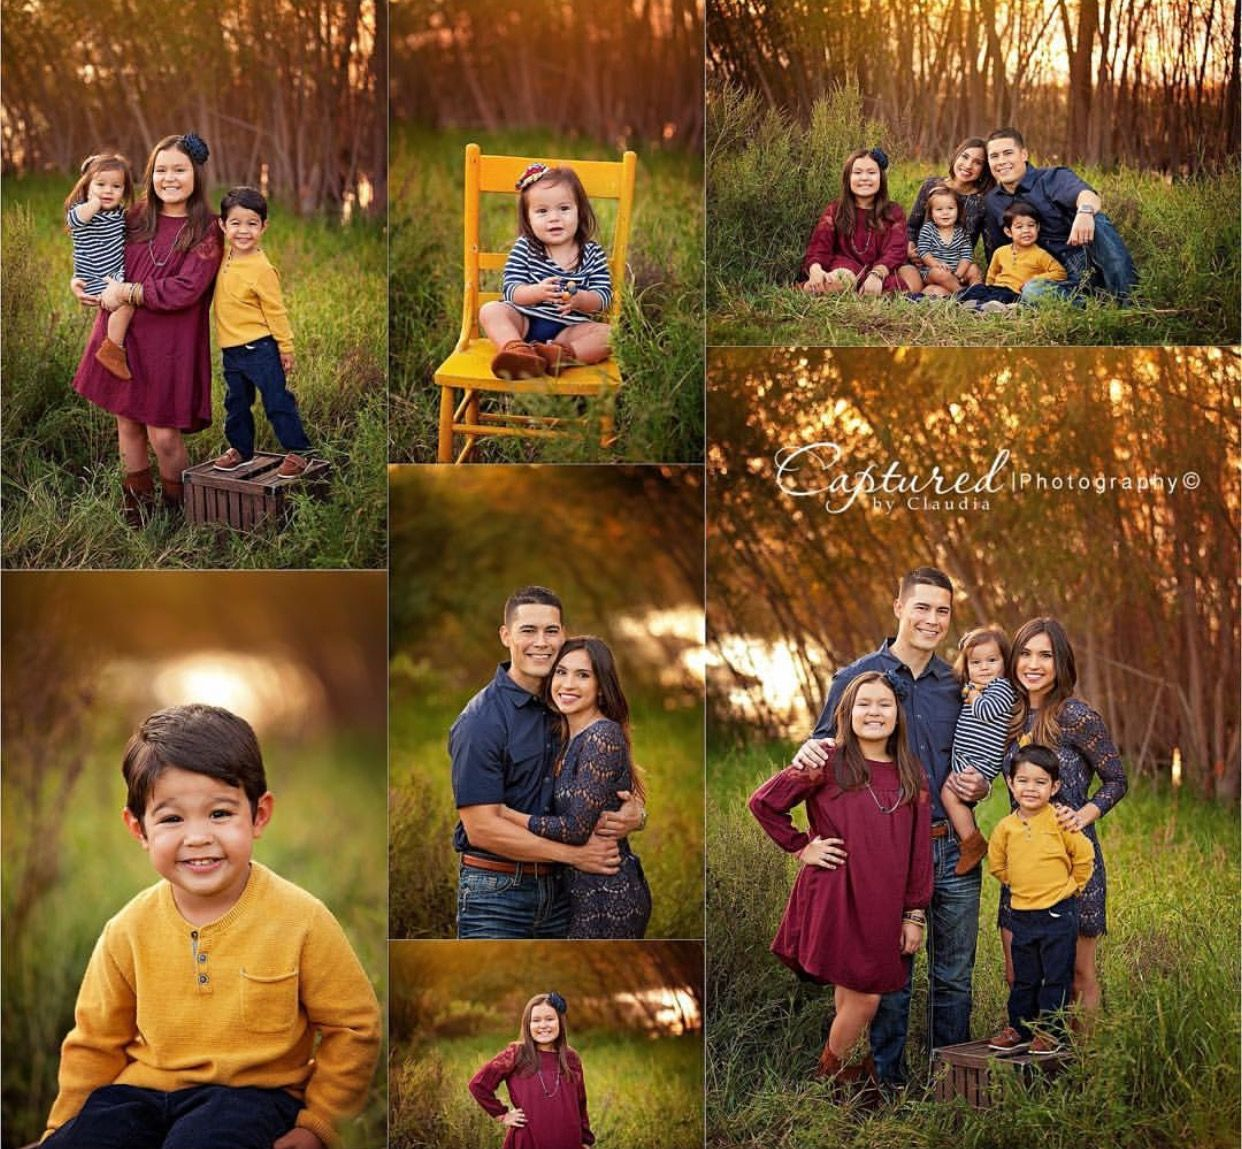 #familyphotooutfits #familyphotooutfits